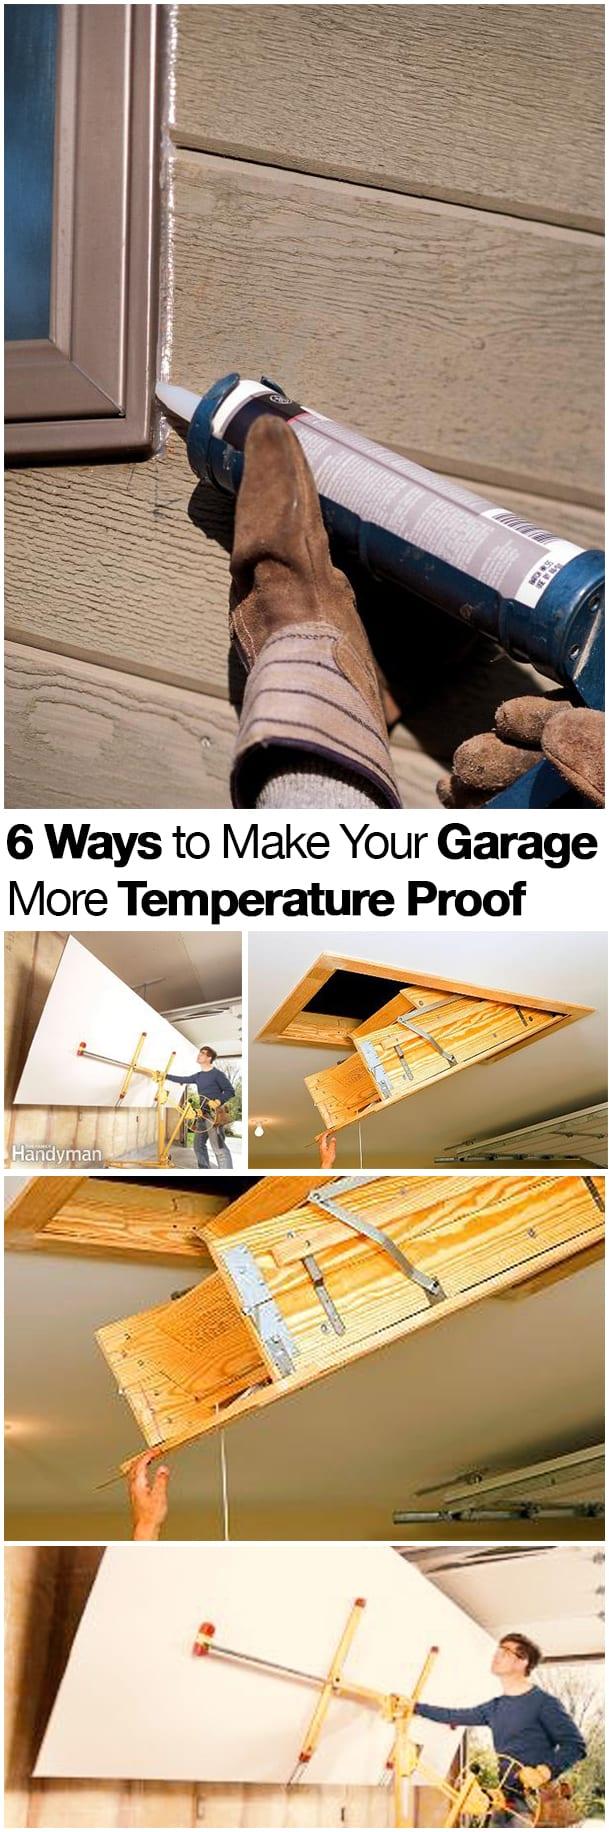 Garage, money saving home improvement, save money, DIY home improvement, popular pin, garage projects, make your garage temperature proof